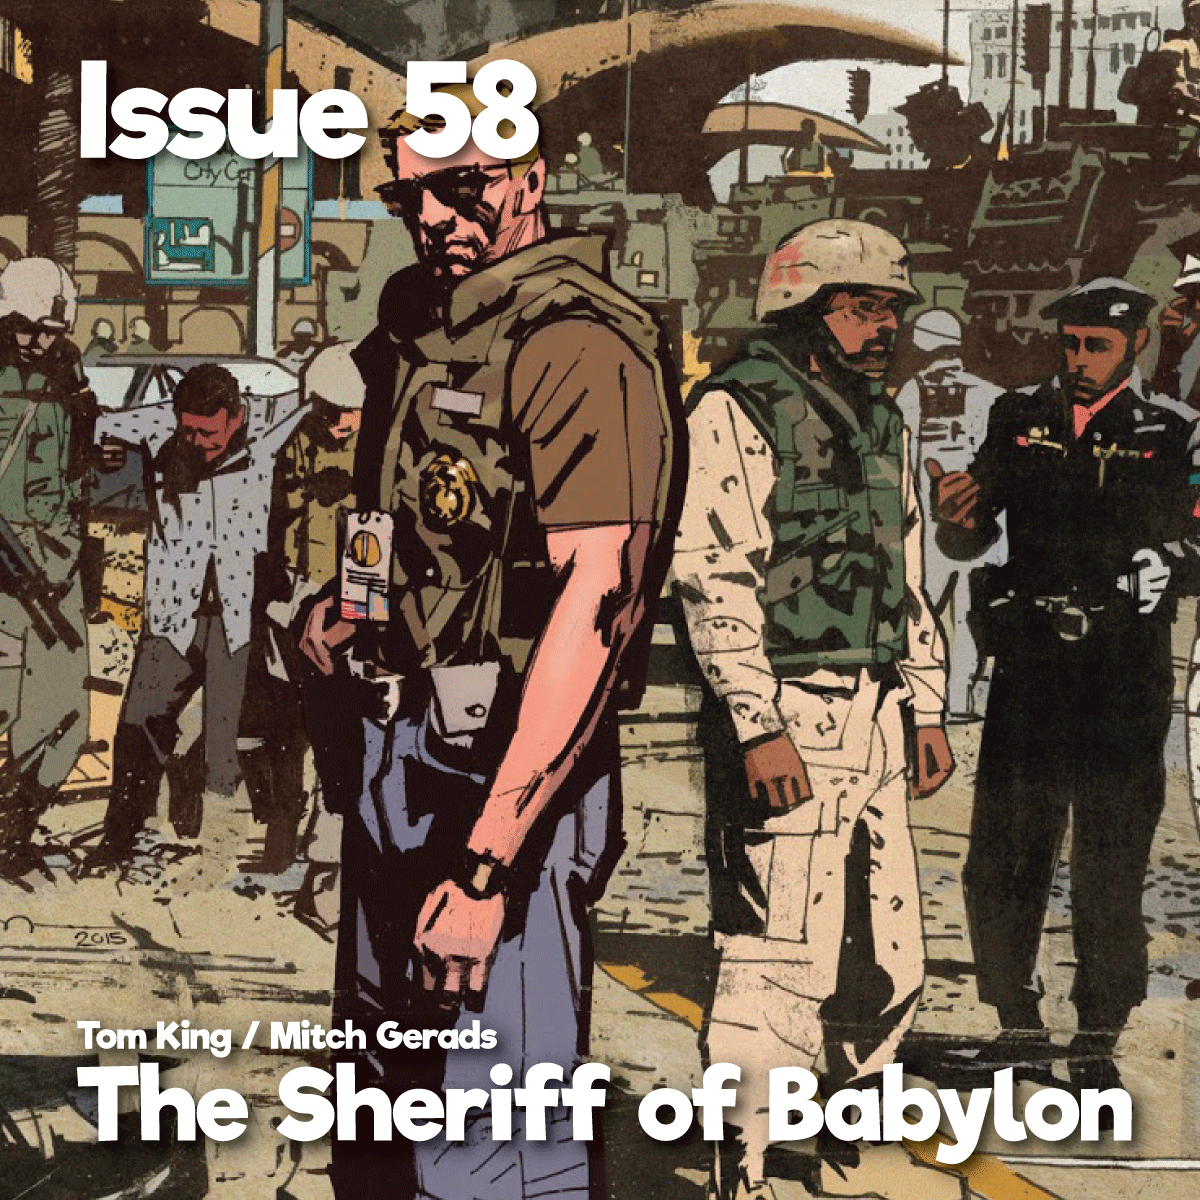 Issue58_Shriffofbabylon_1200x1200.png